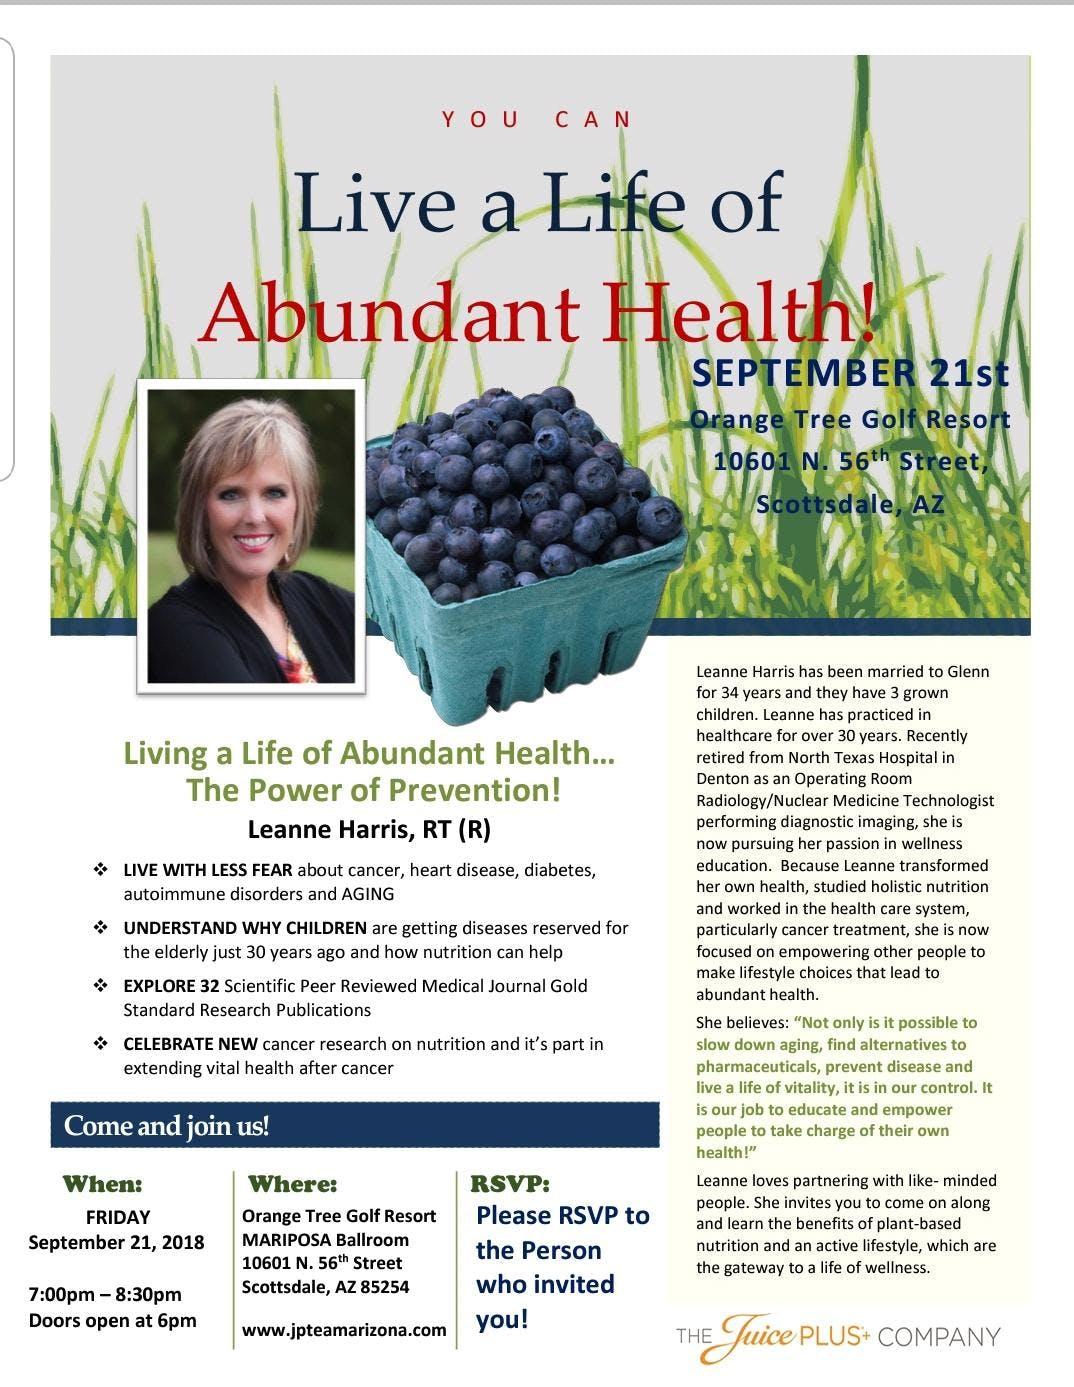 Phoenix- Inspiring Healthy Living - Friday September 21 - Live a Life of Abundant Health